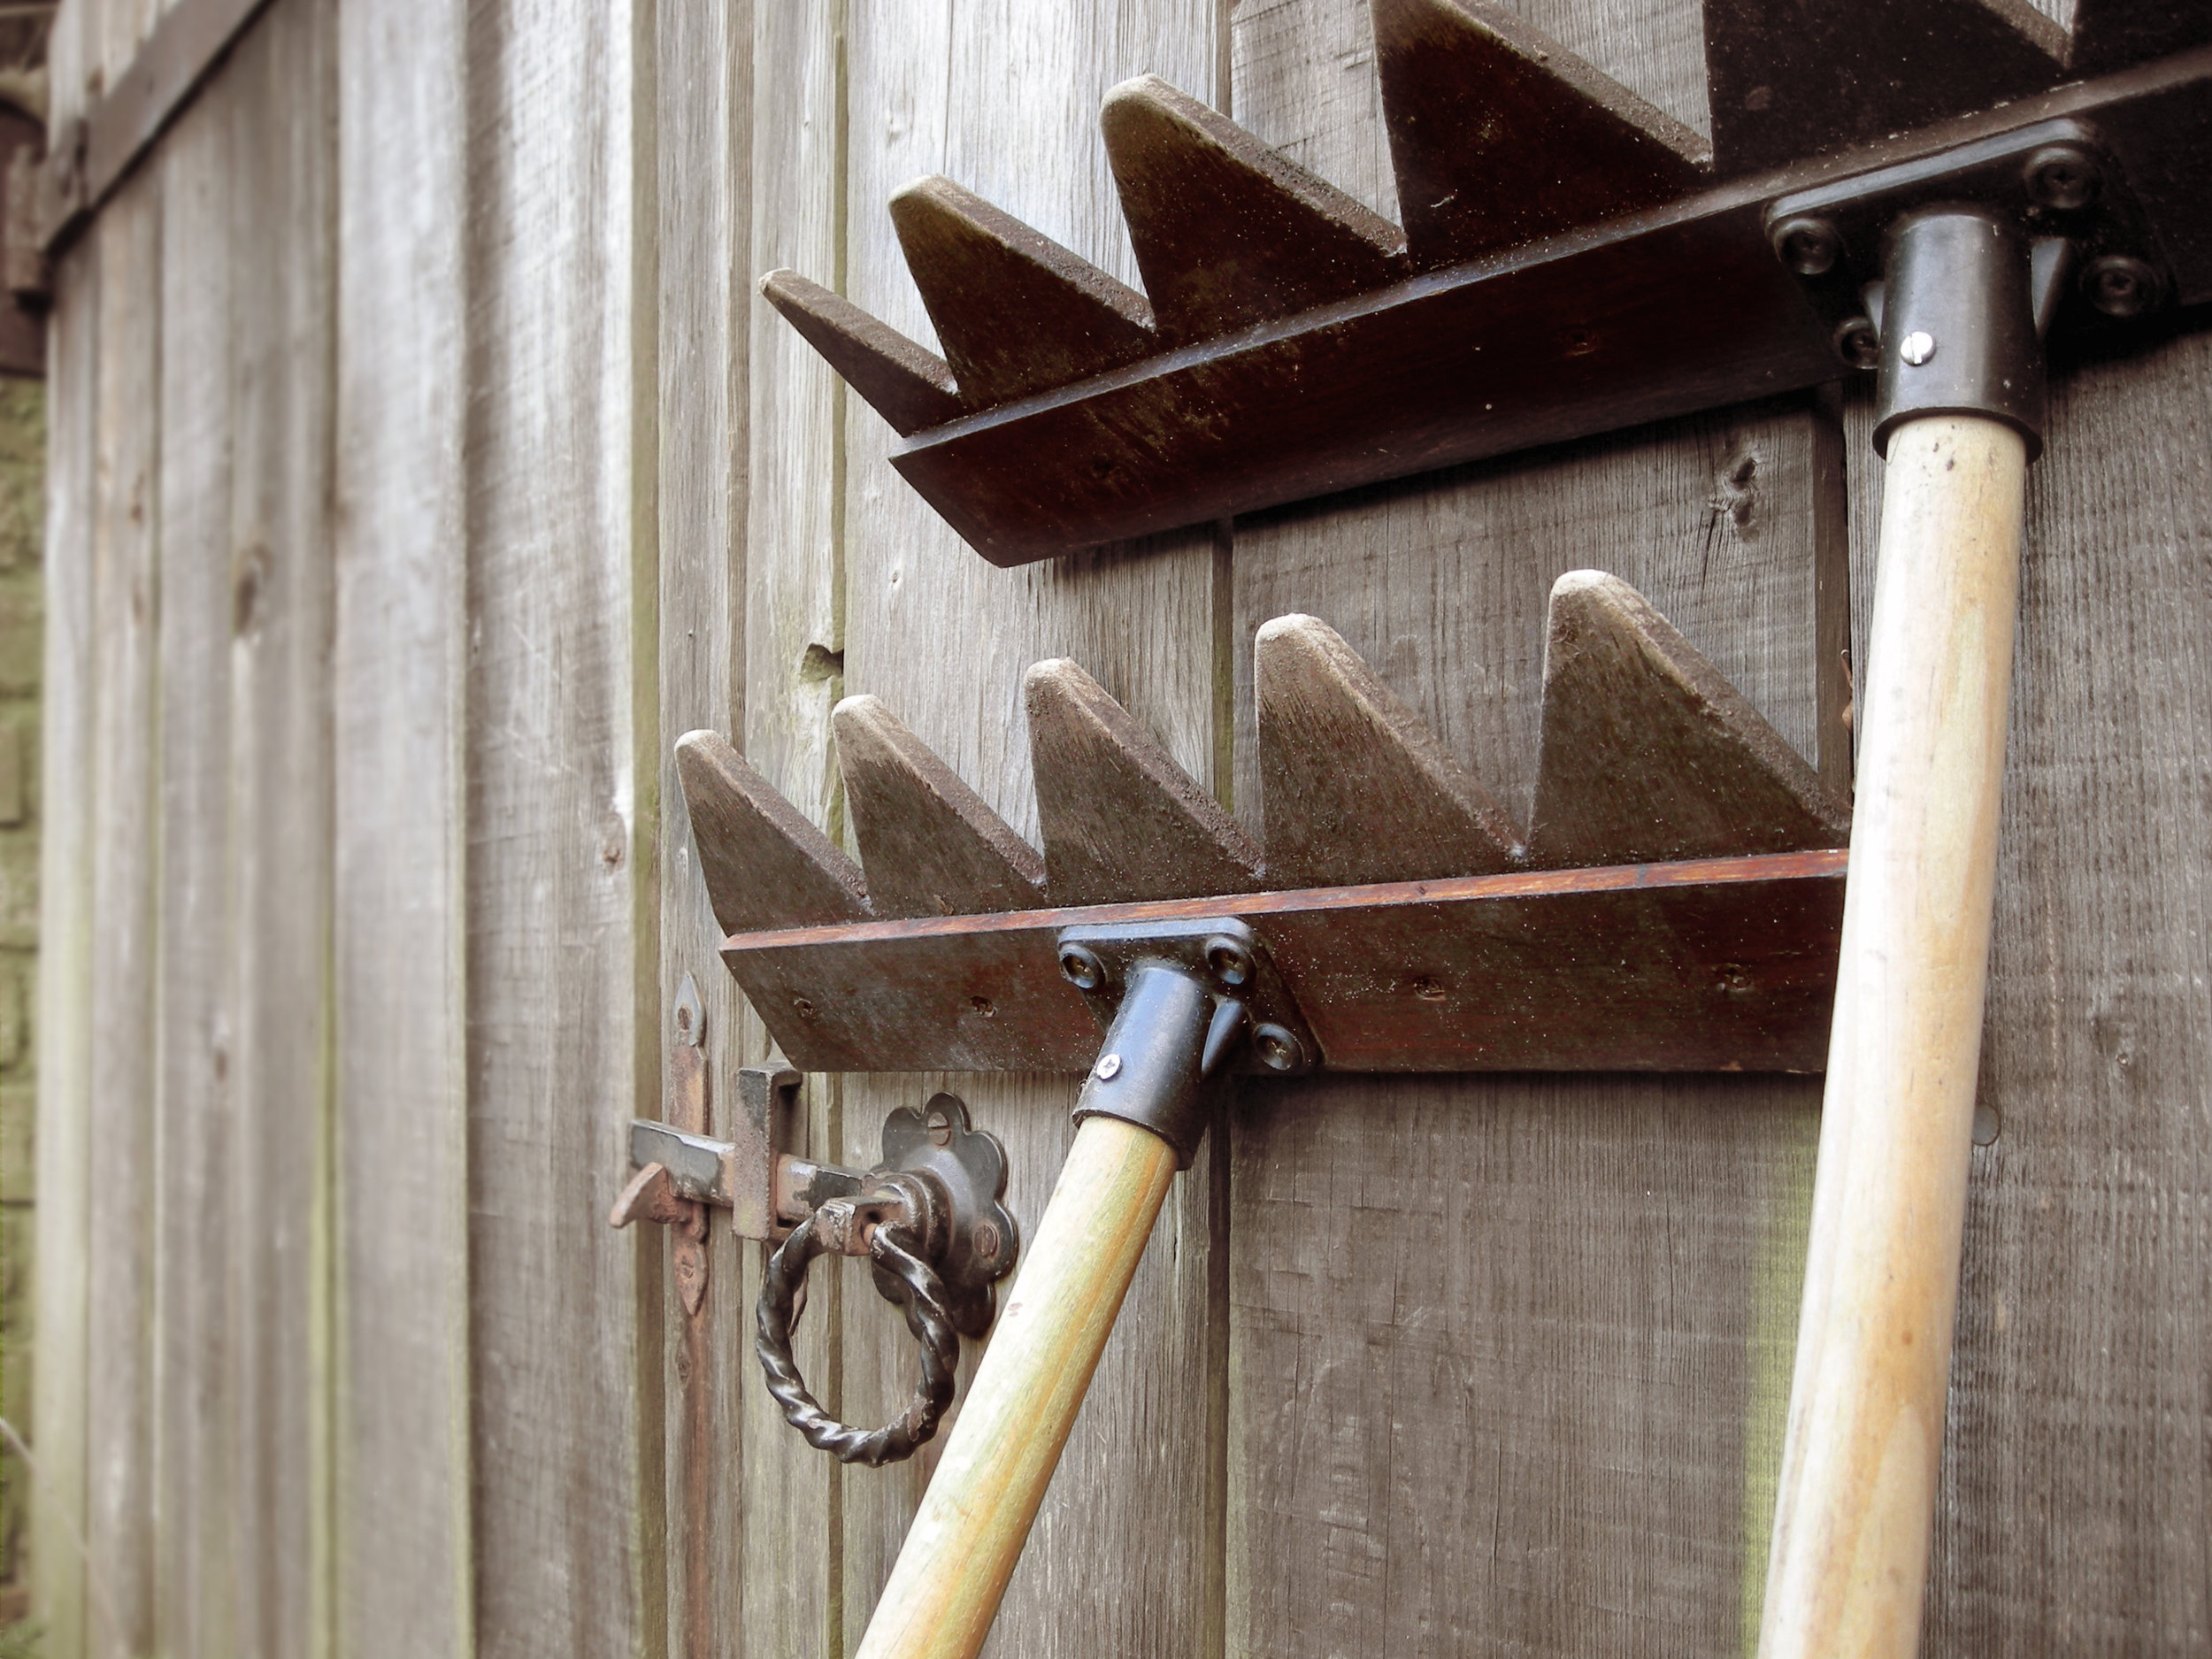 Two gravel rakes leaning against wooden gate